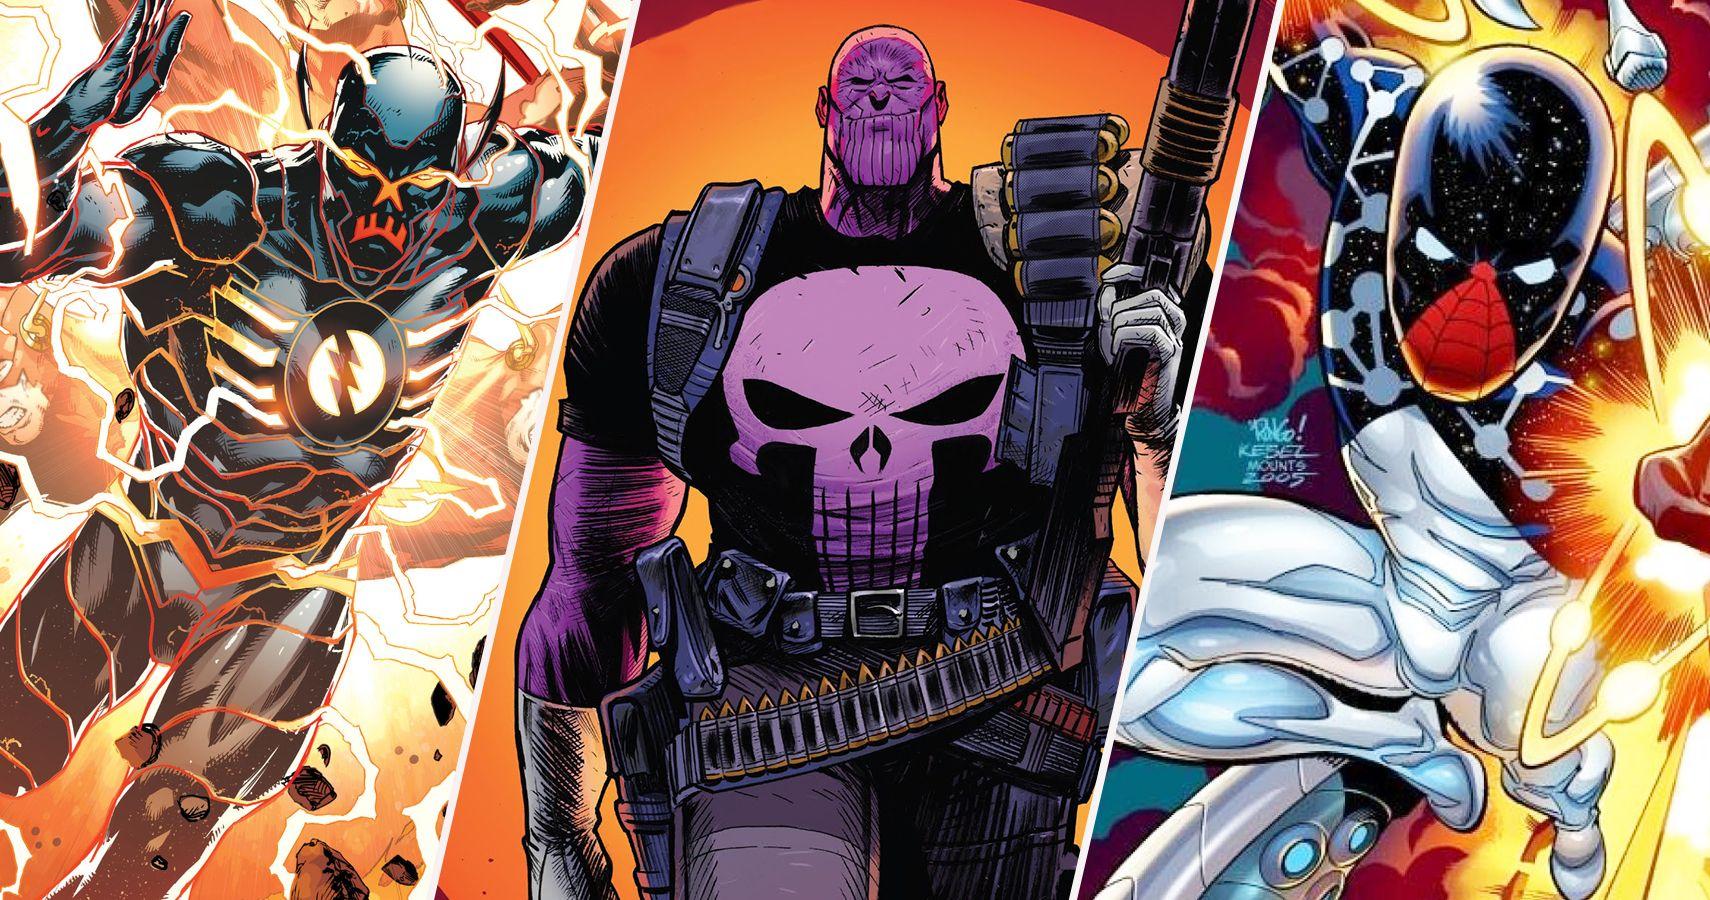 20 Cosmic Versions Of Superheroes Ranked By Power | CBR